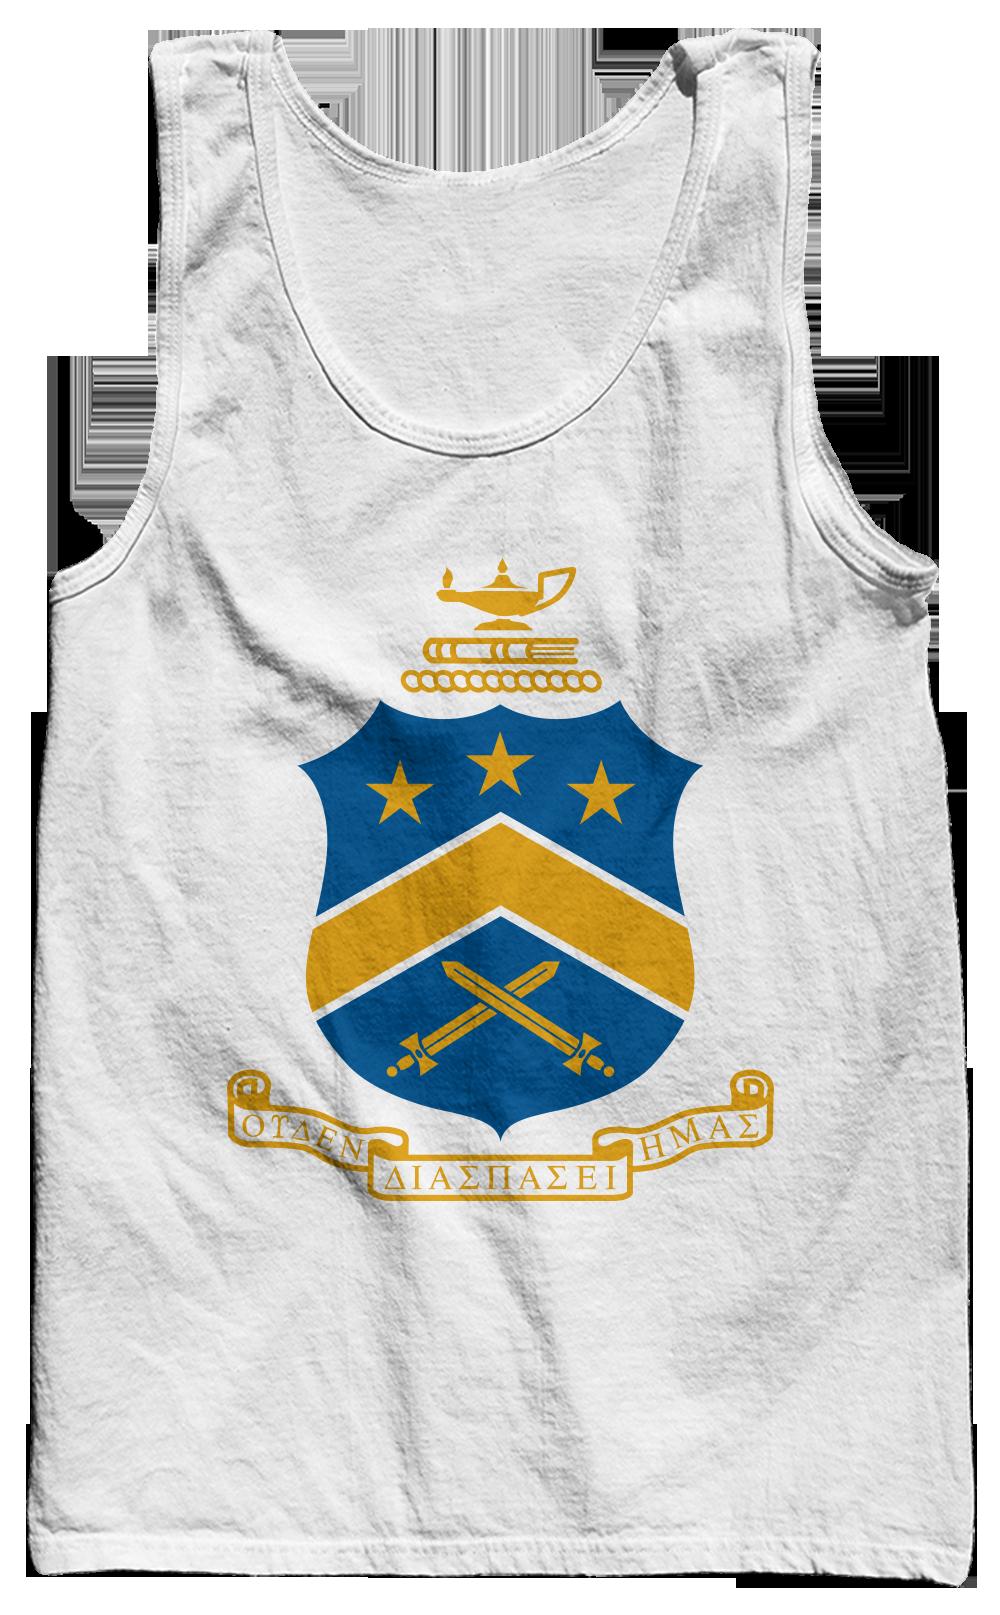 Pi Kappa Phi Crest Tank Top Lsu Pinterest Kappa And Alpha